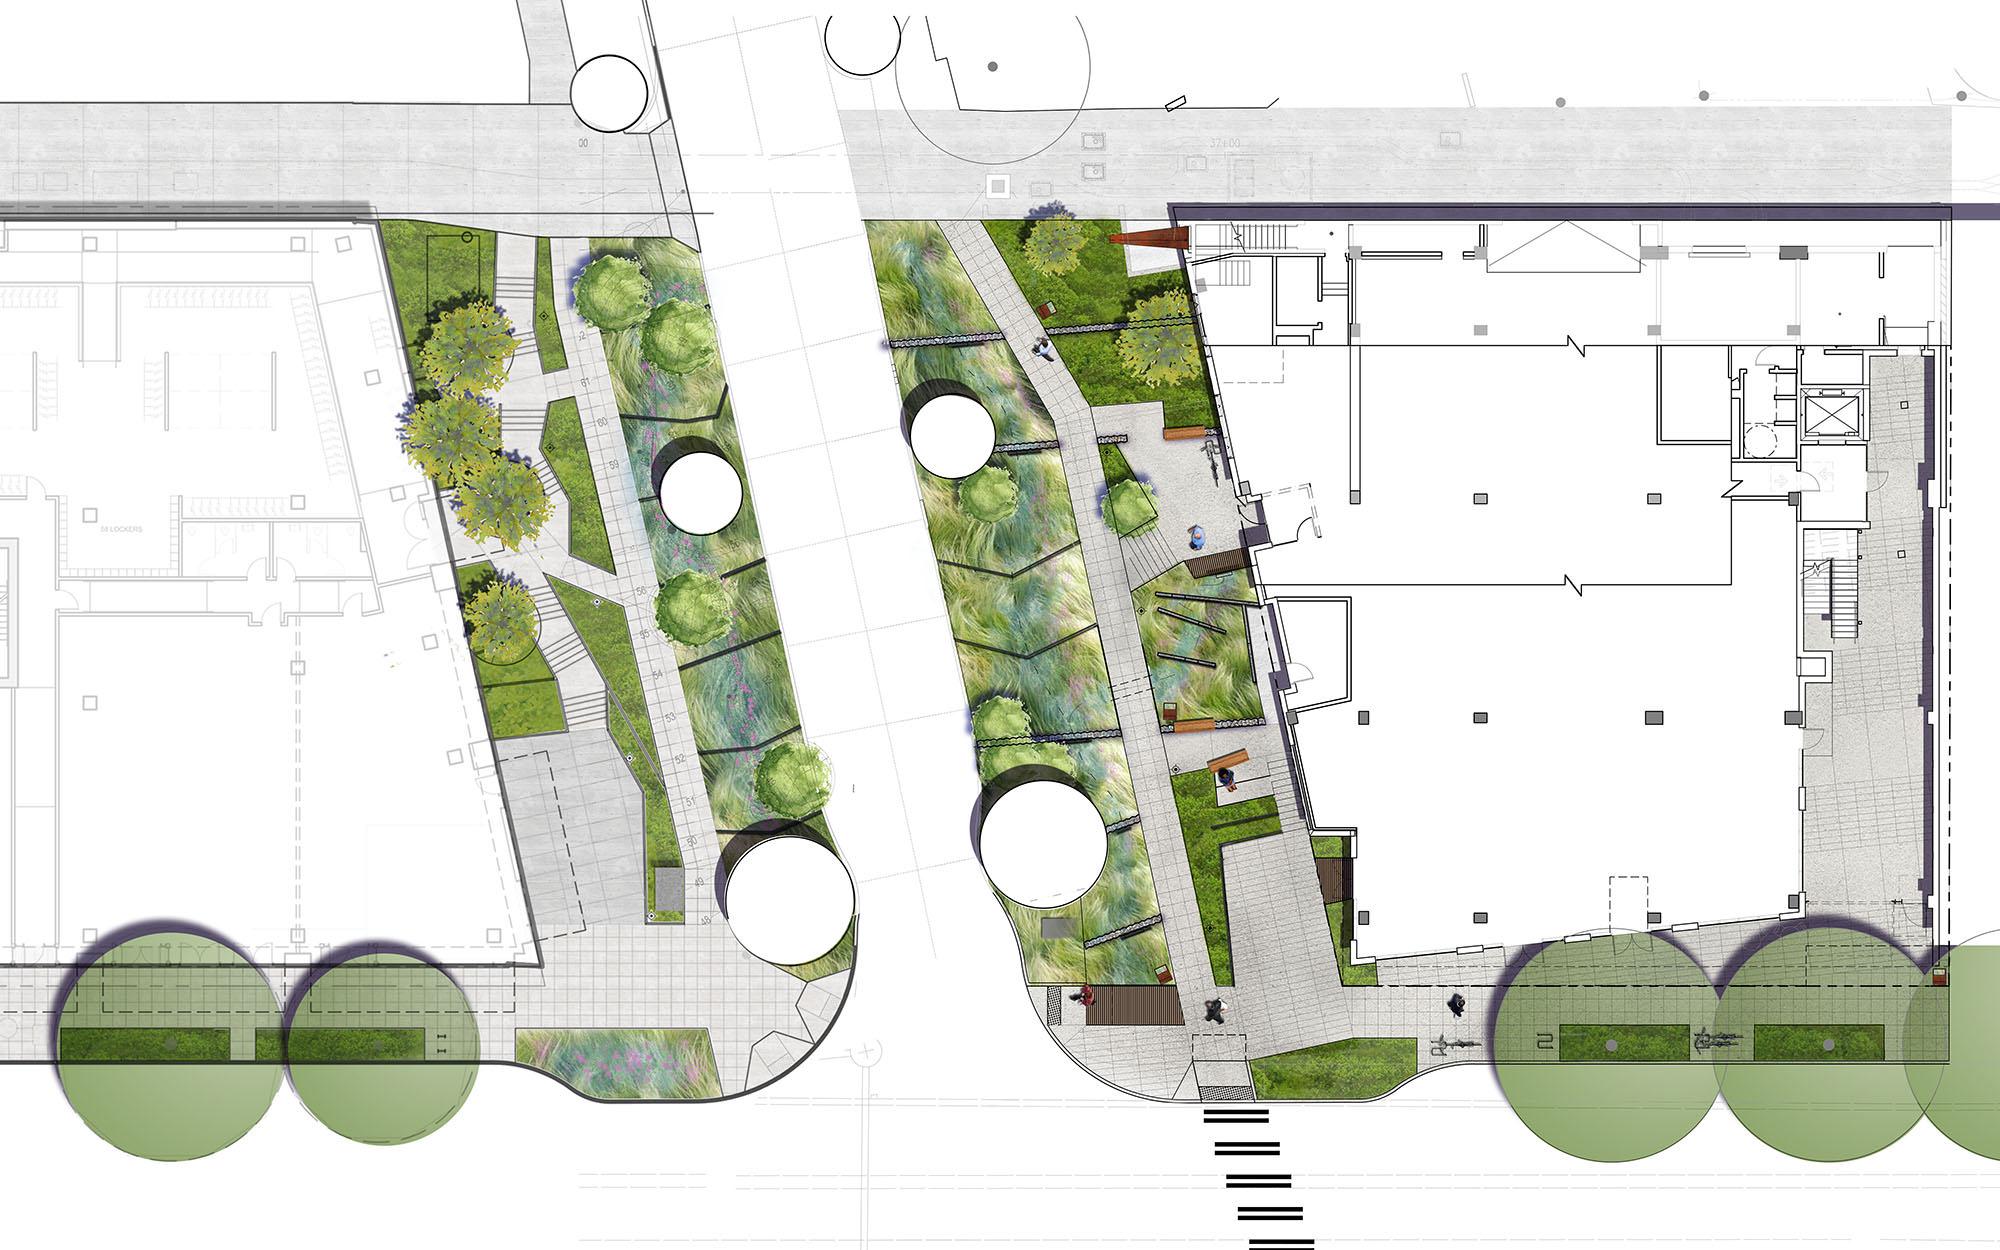 Aurora Bridge Swales Landscape Architecture